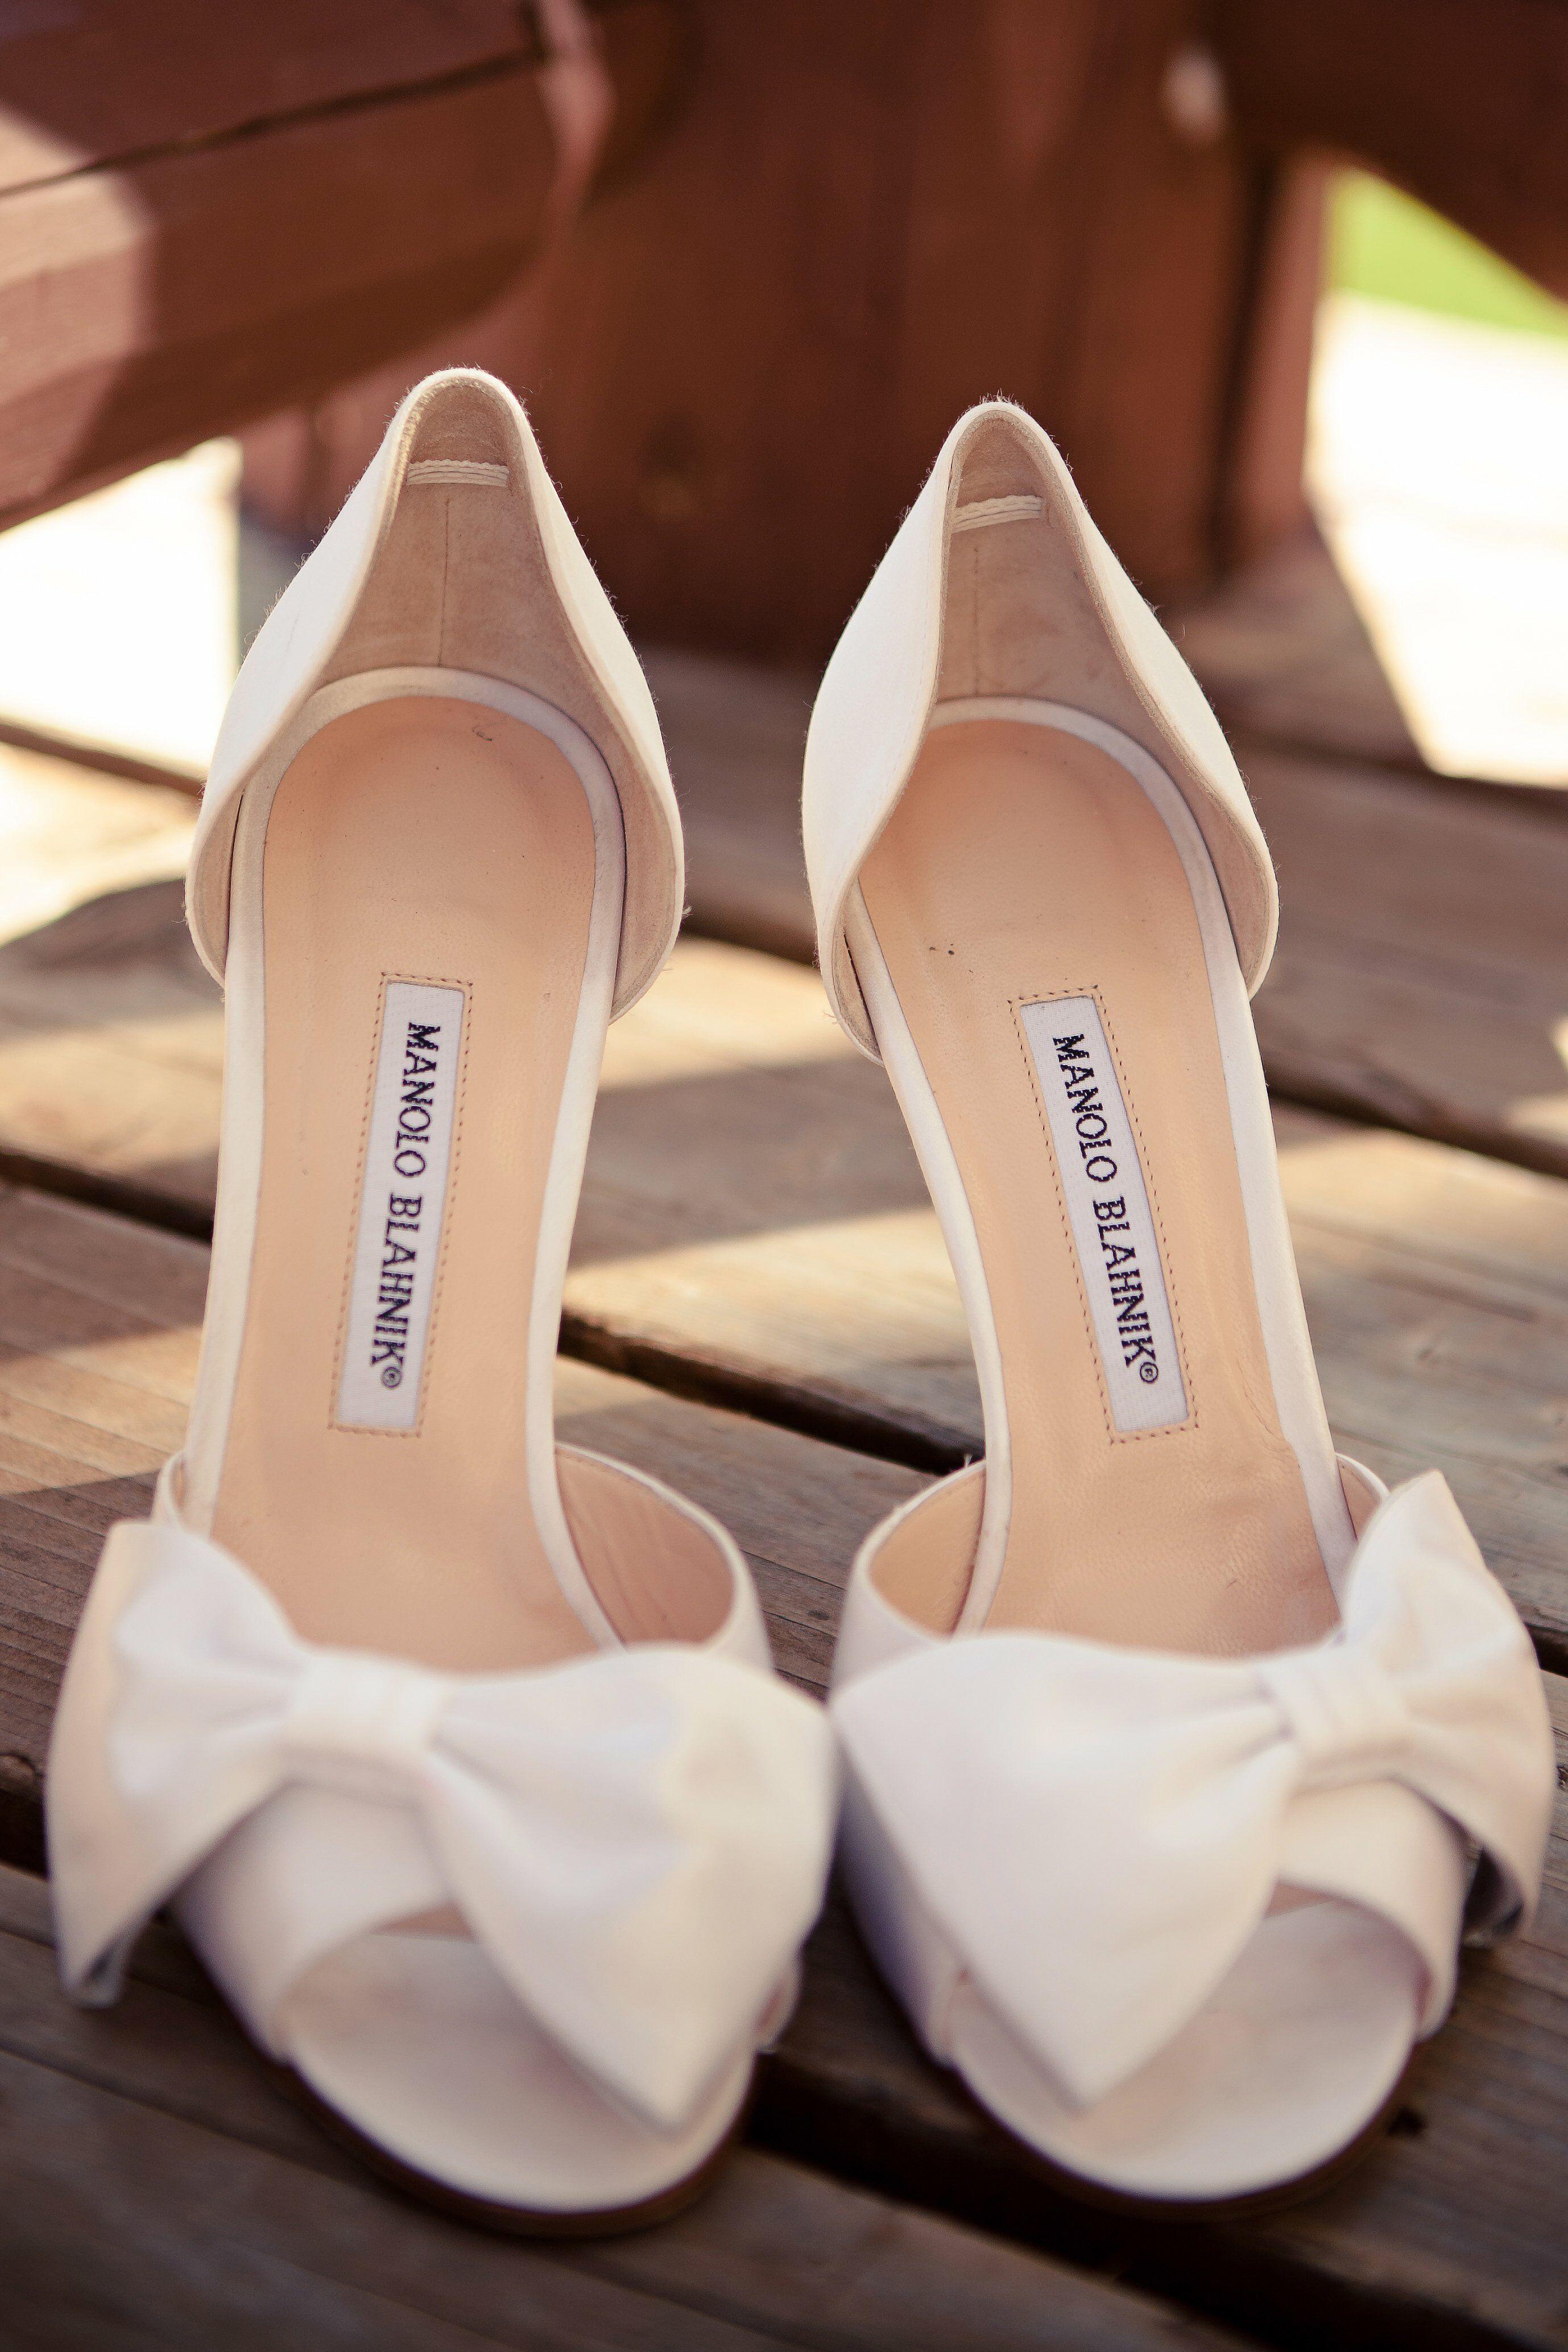 buy manolo blahnik bridal shoes